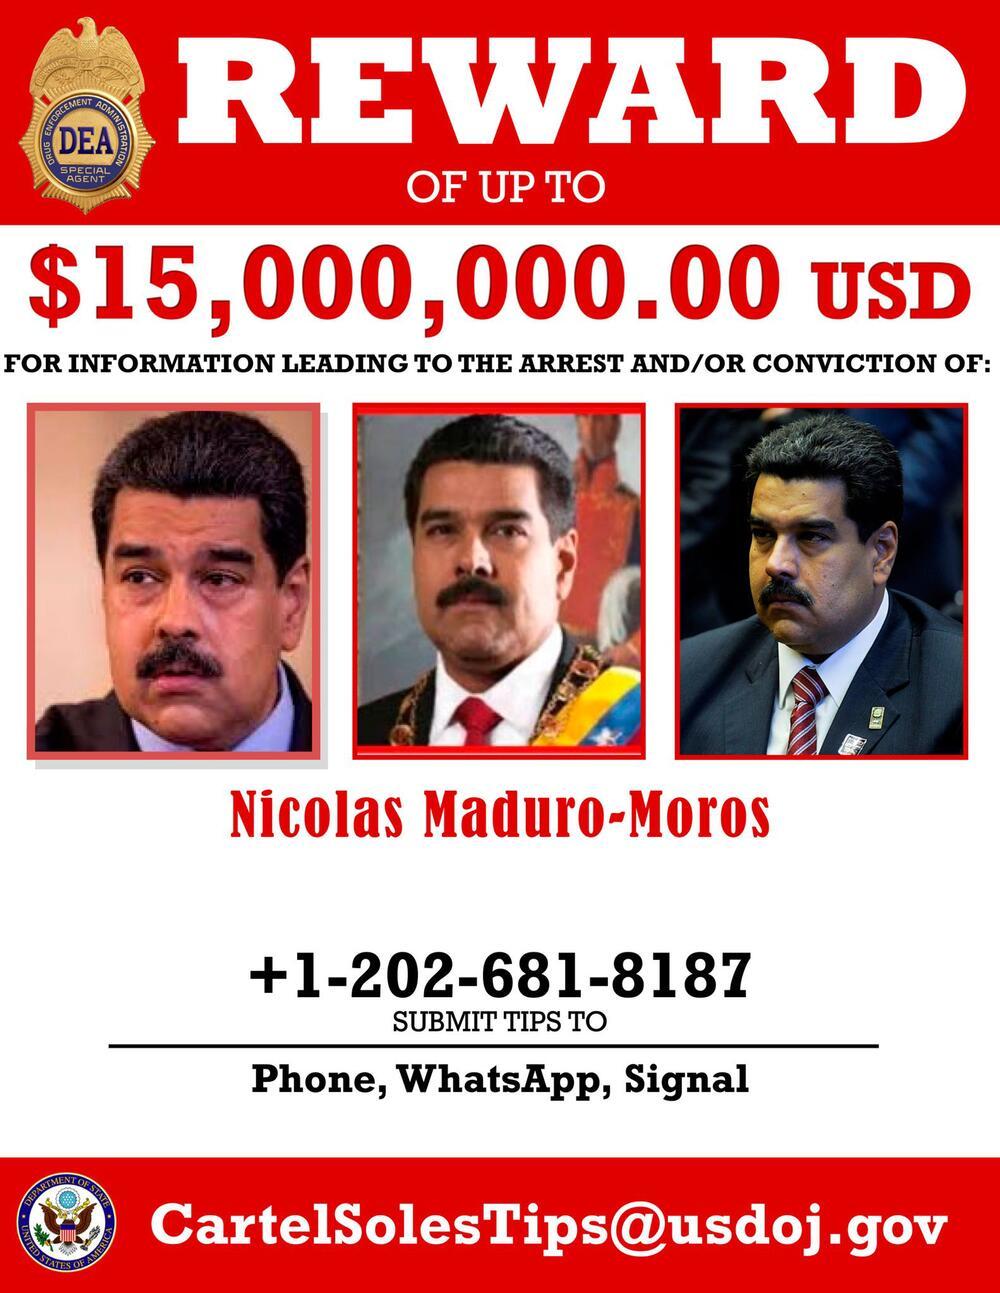 USA klagen Venezuelas Präsidenten Maduro wegen Drogenhandels an